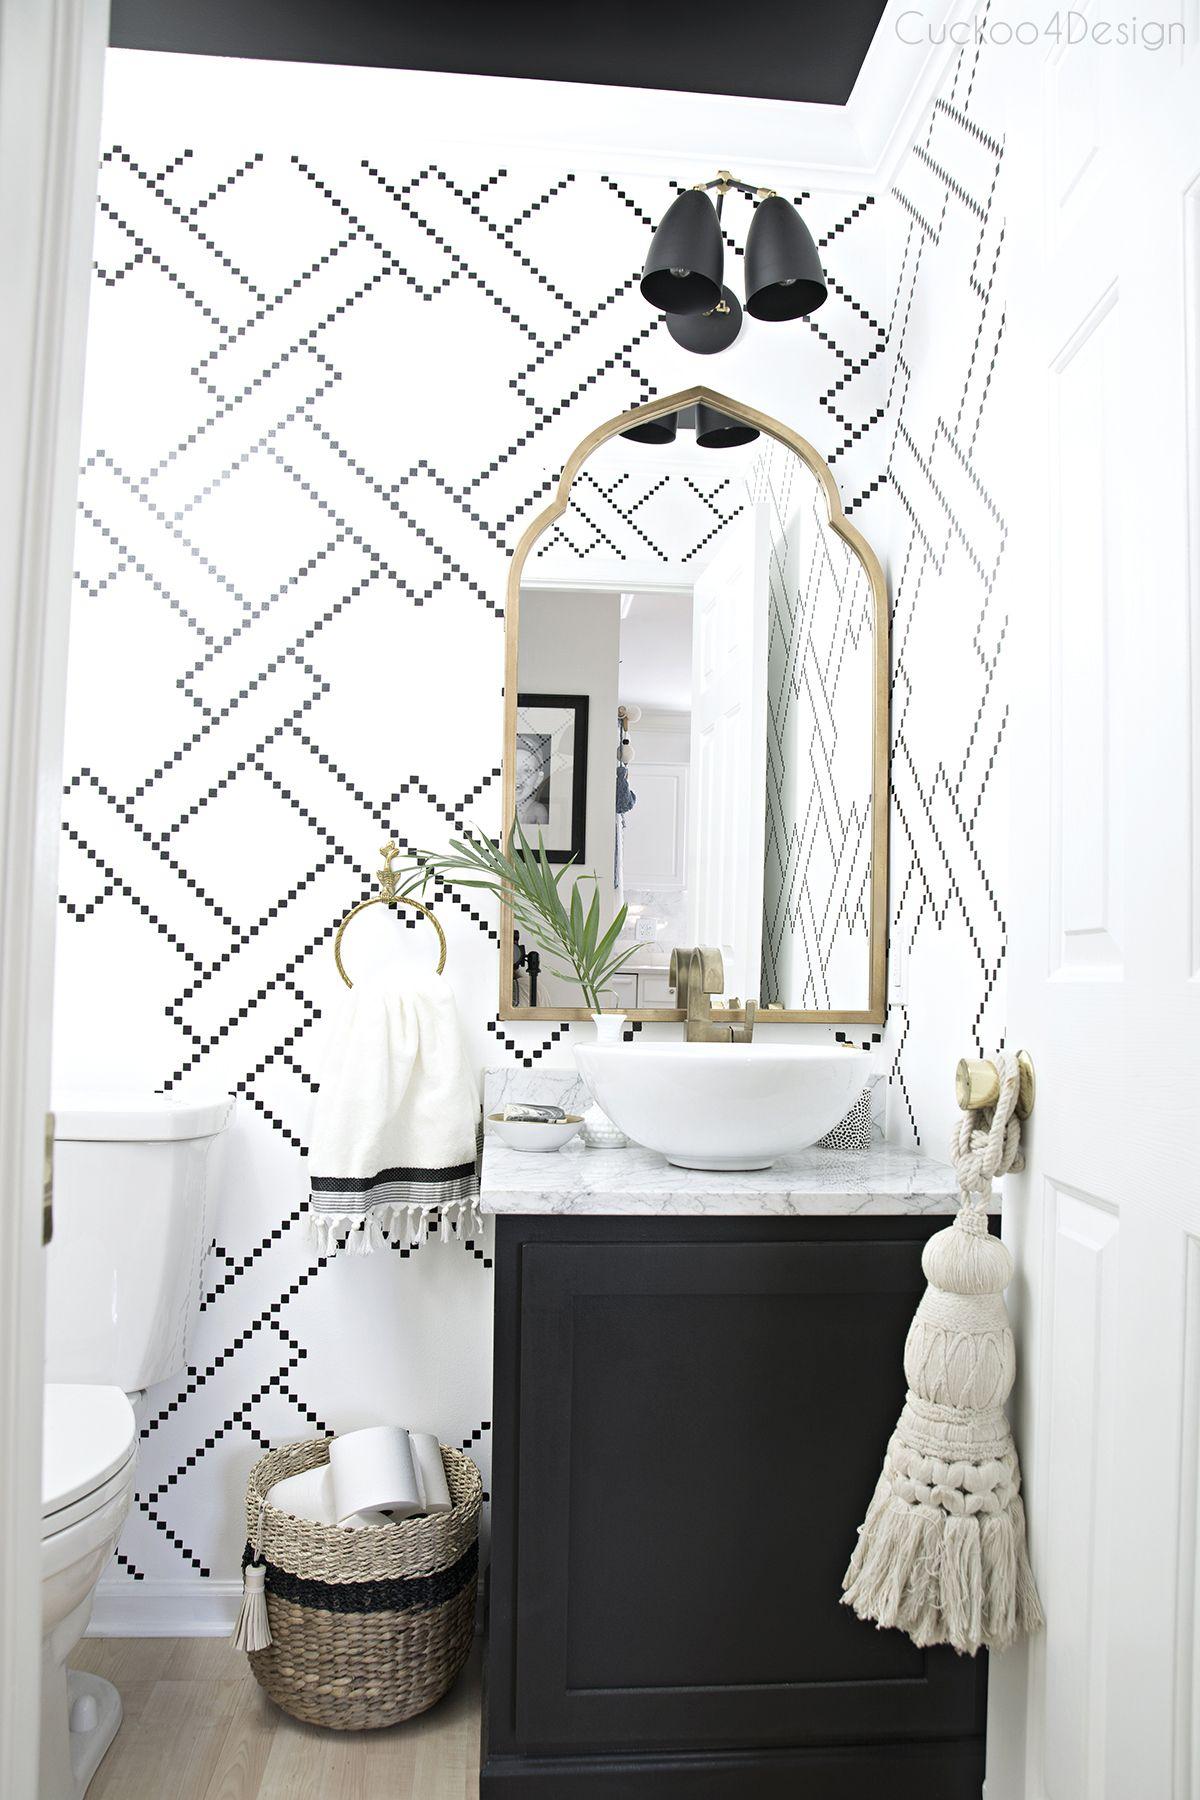 A Hint Of Fall Tour Powder Room Design Powder Room Wallpaper